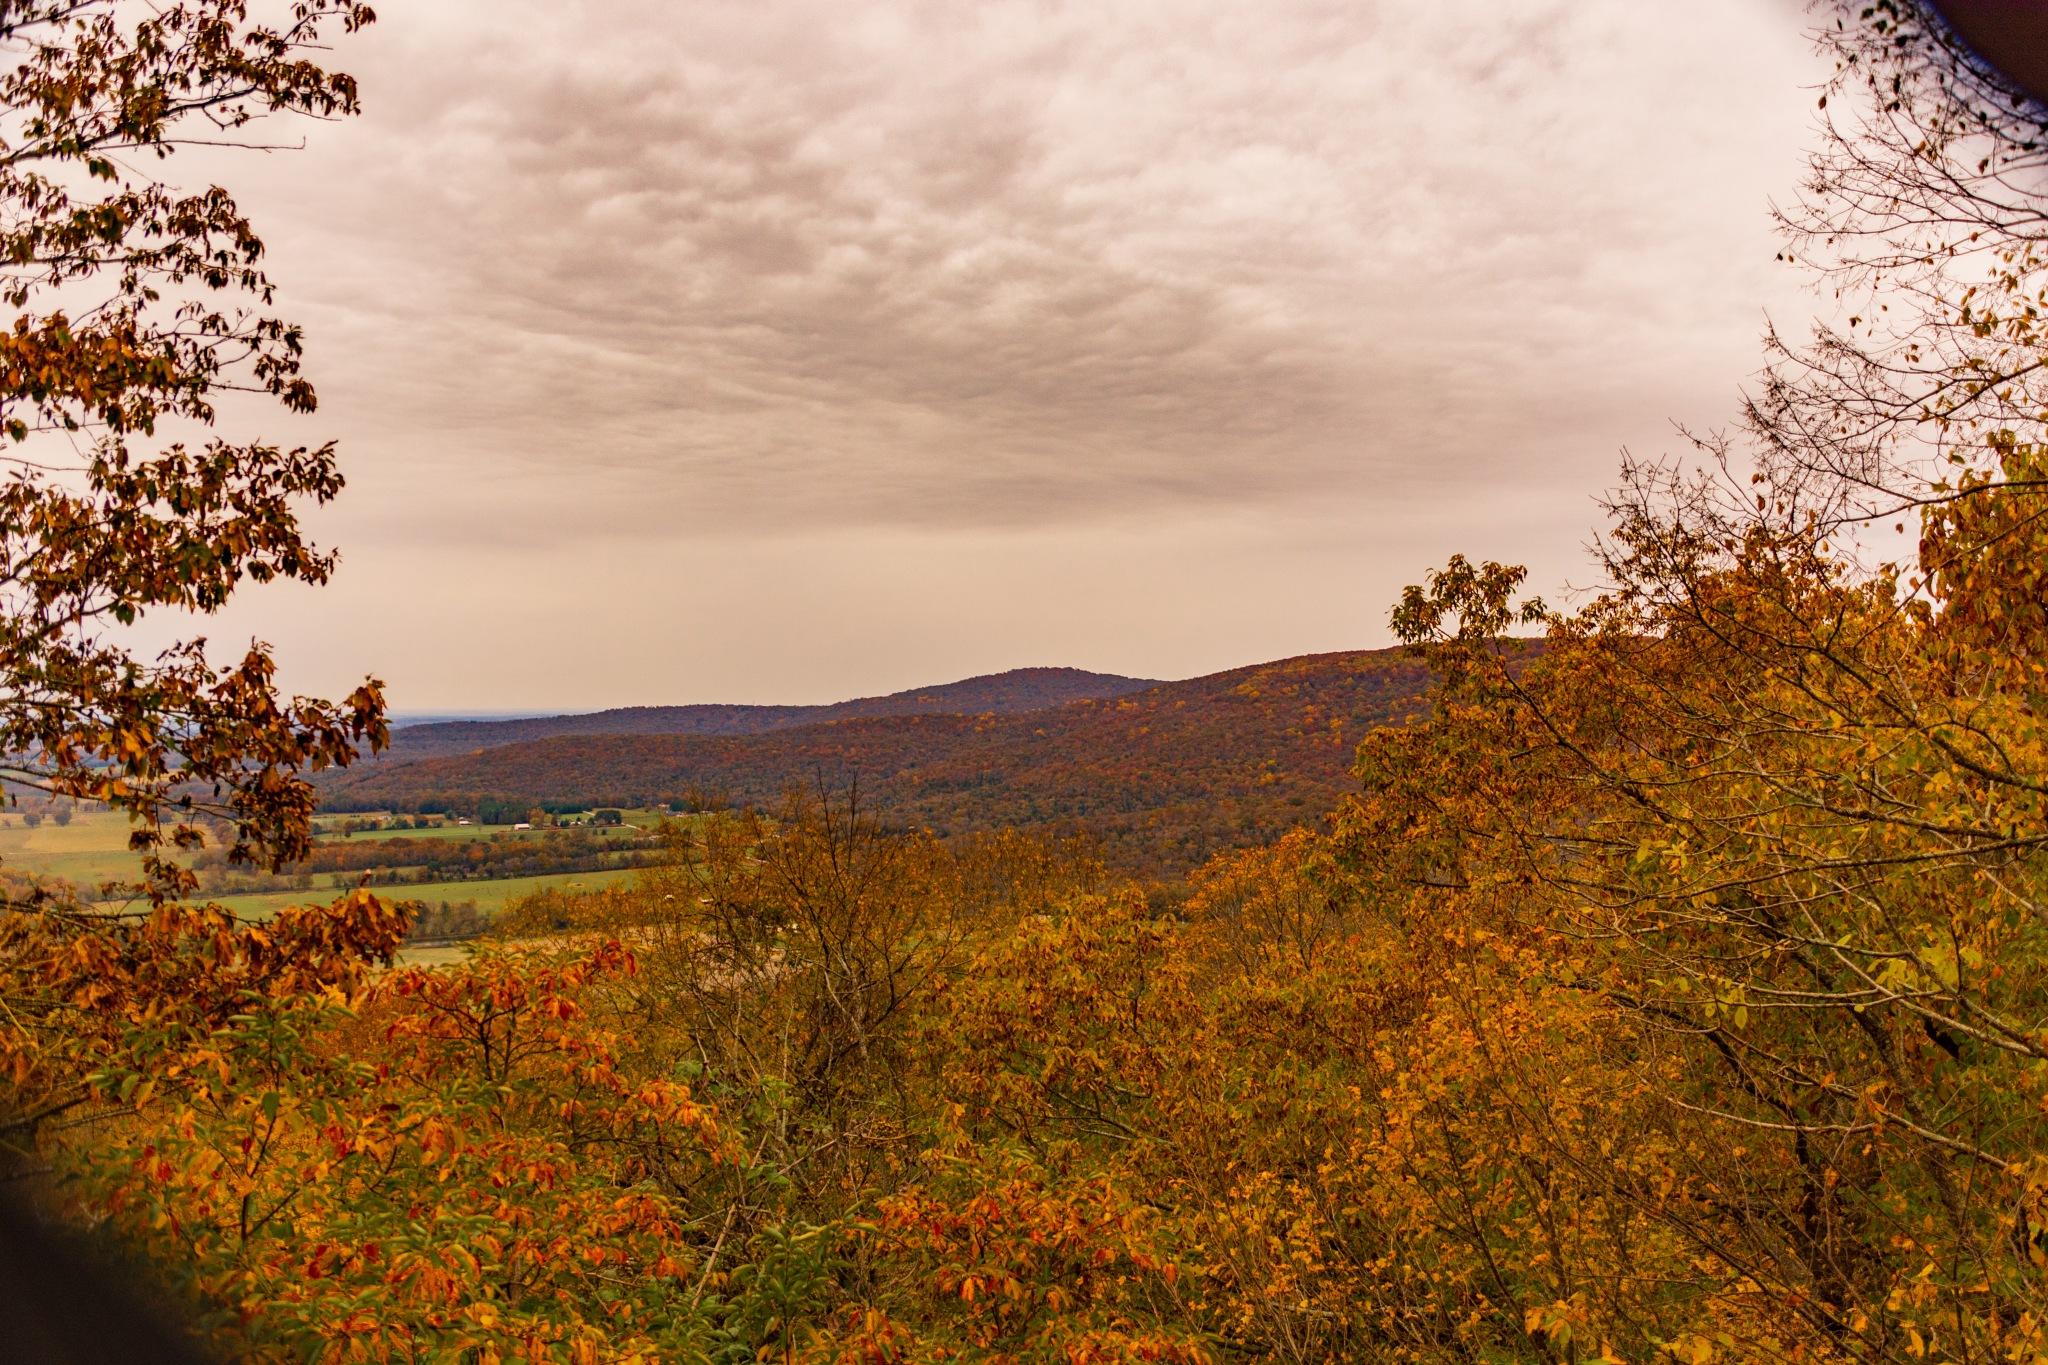 Autumn View by Greg Knott